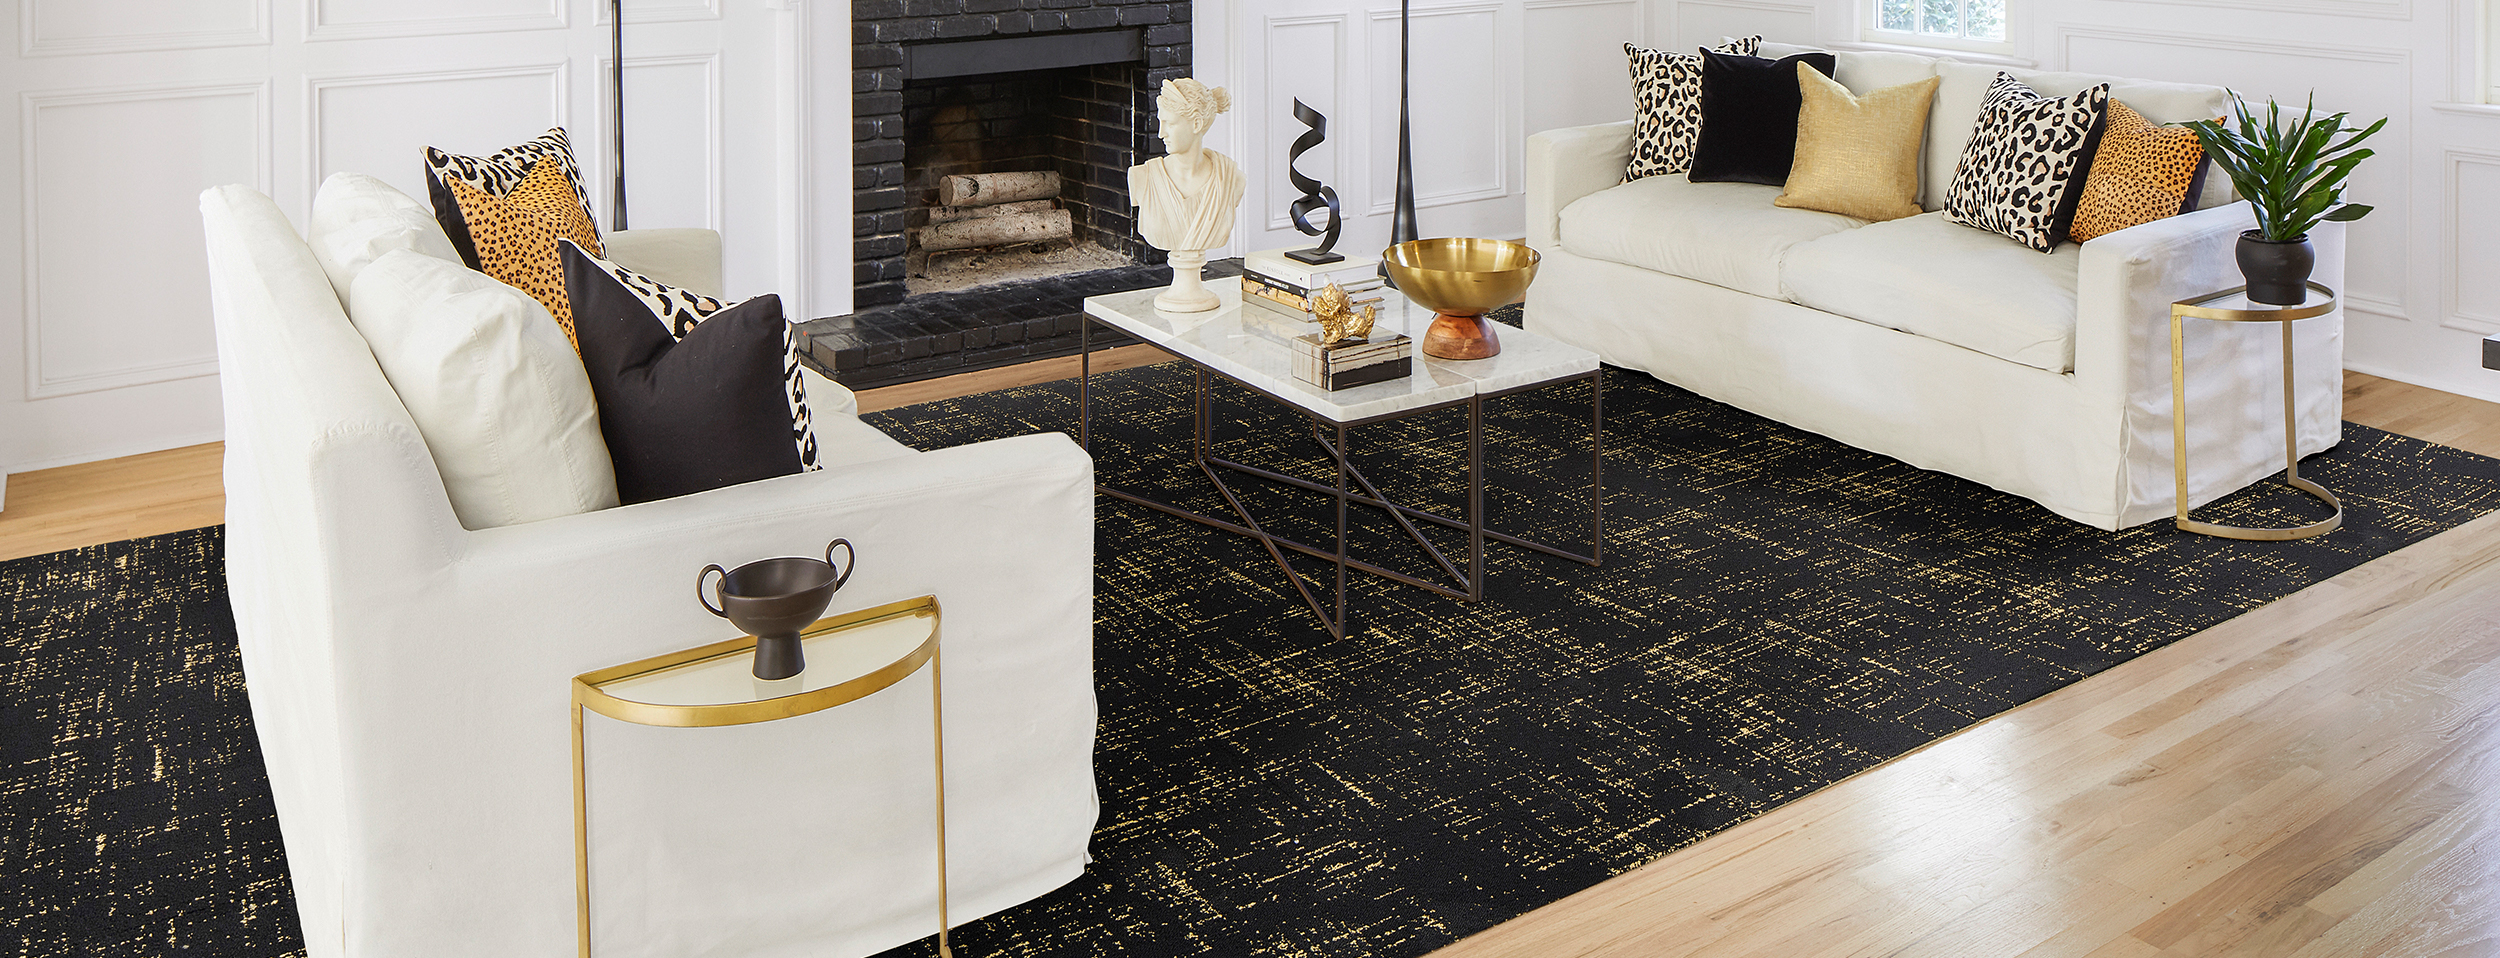 Tuxedo Pocket Black Gold All Area Rugs Carpet Tiles By Flor